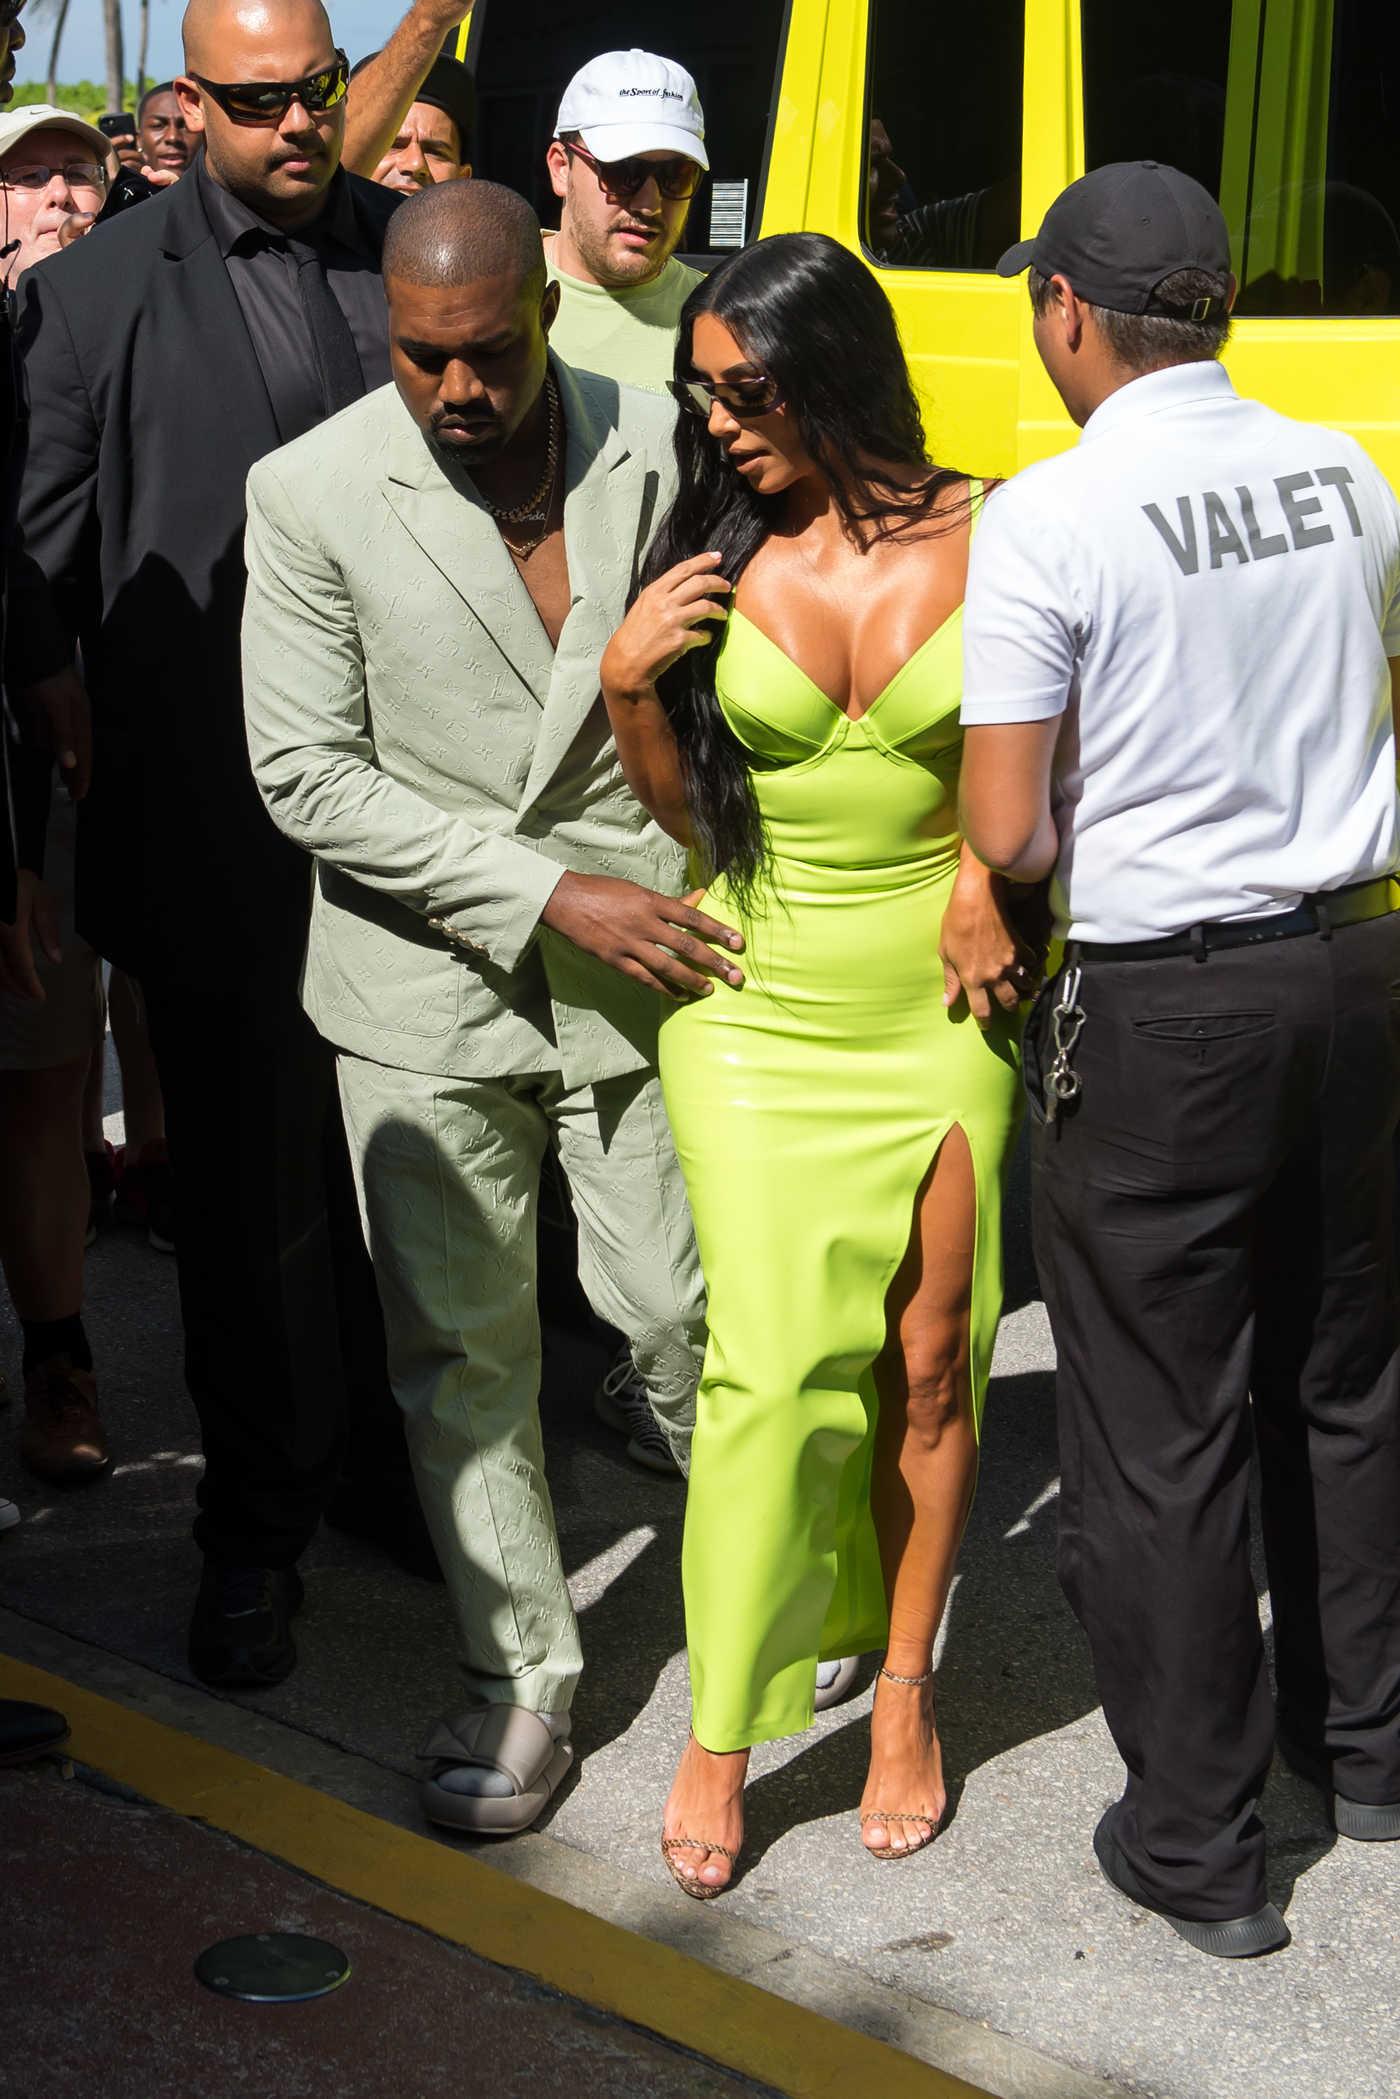 Kim Kardashian Arrives at 2-Chainz's Wedding in Miami 08/18/2018